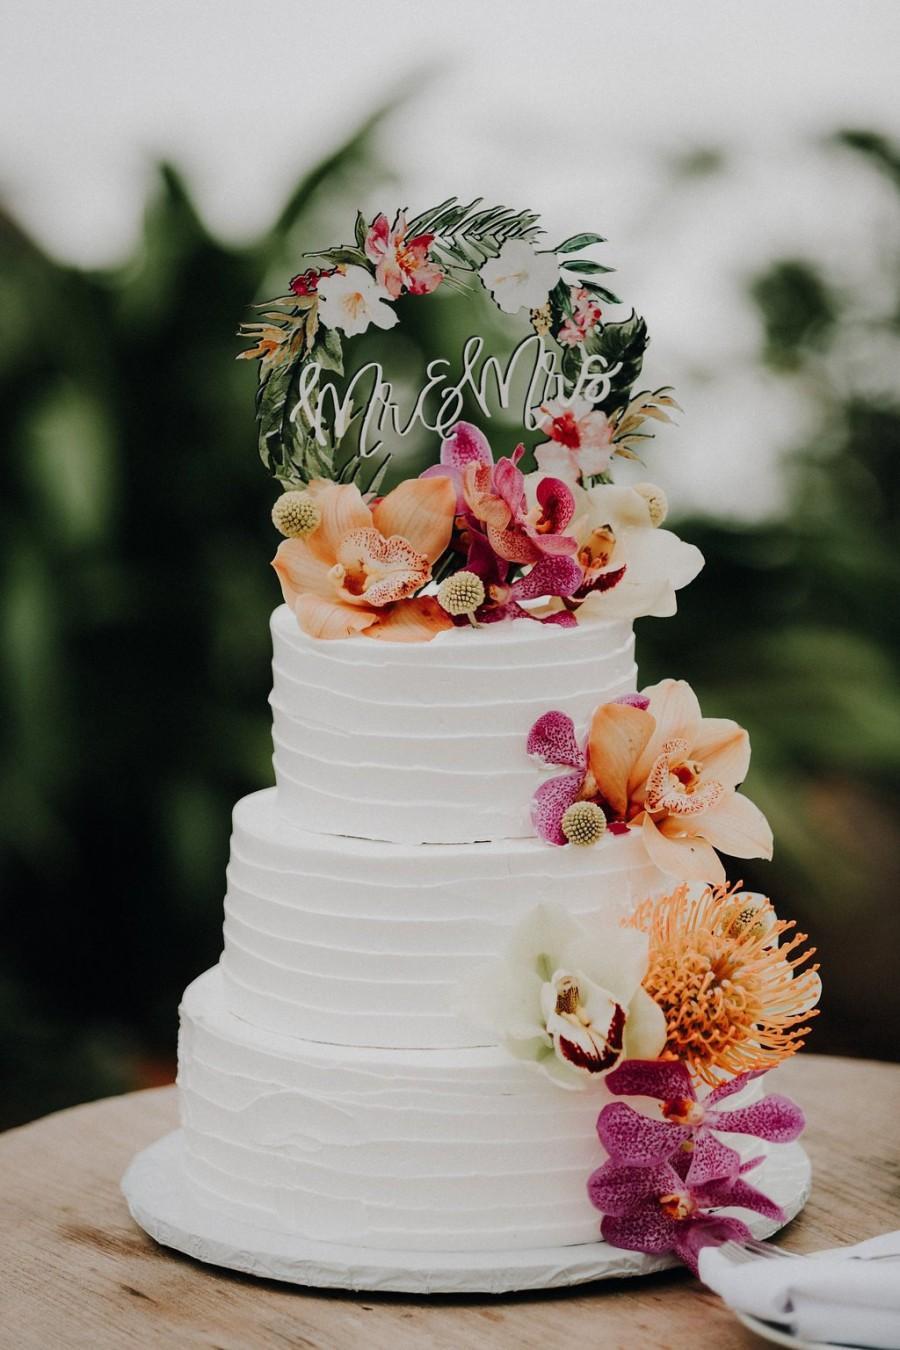 Wedding - Tropical Wedding Cake Topper Floral Wreath Mr & Mrs Colorful Wooden Cake Decoration Wedding Decor Beach Destination Wedding (Item - TRM840)